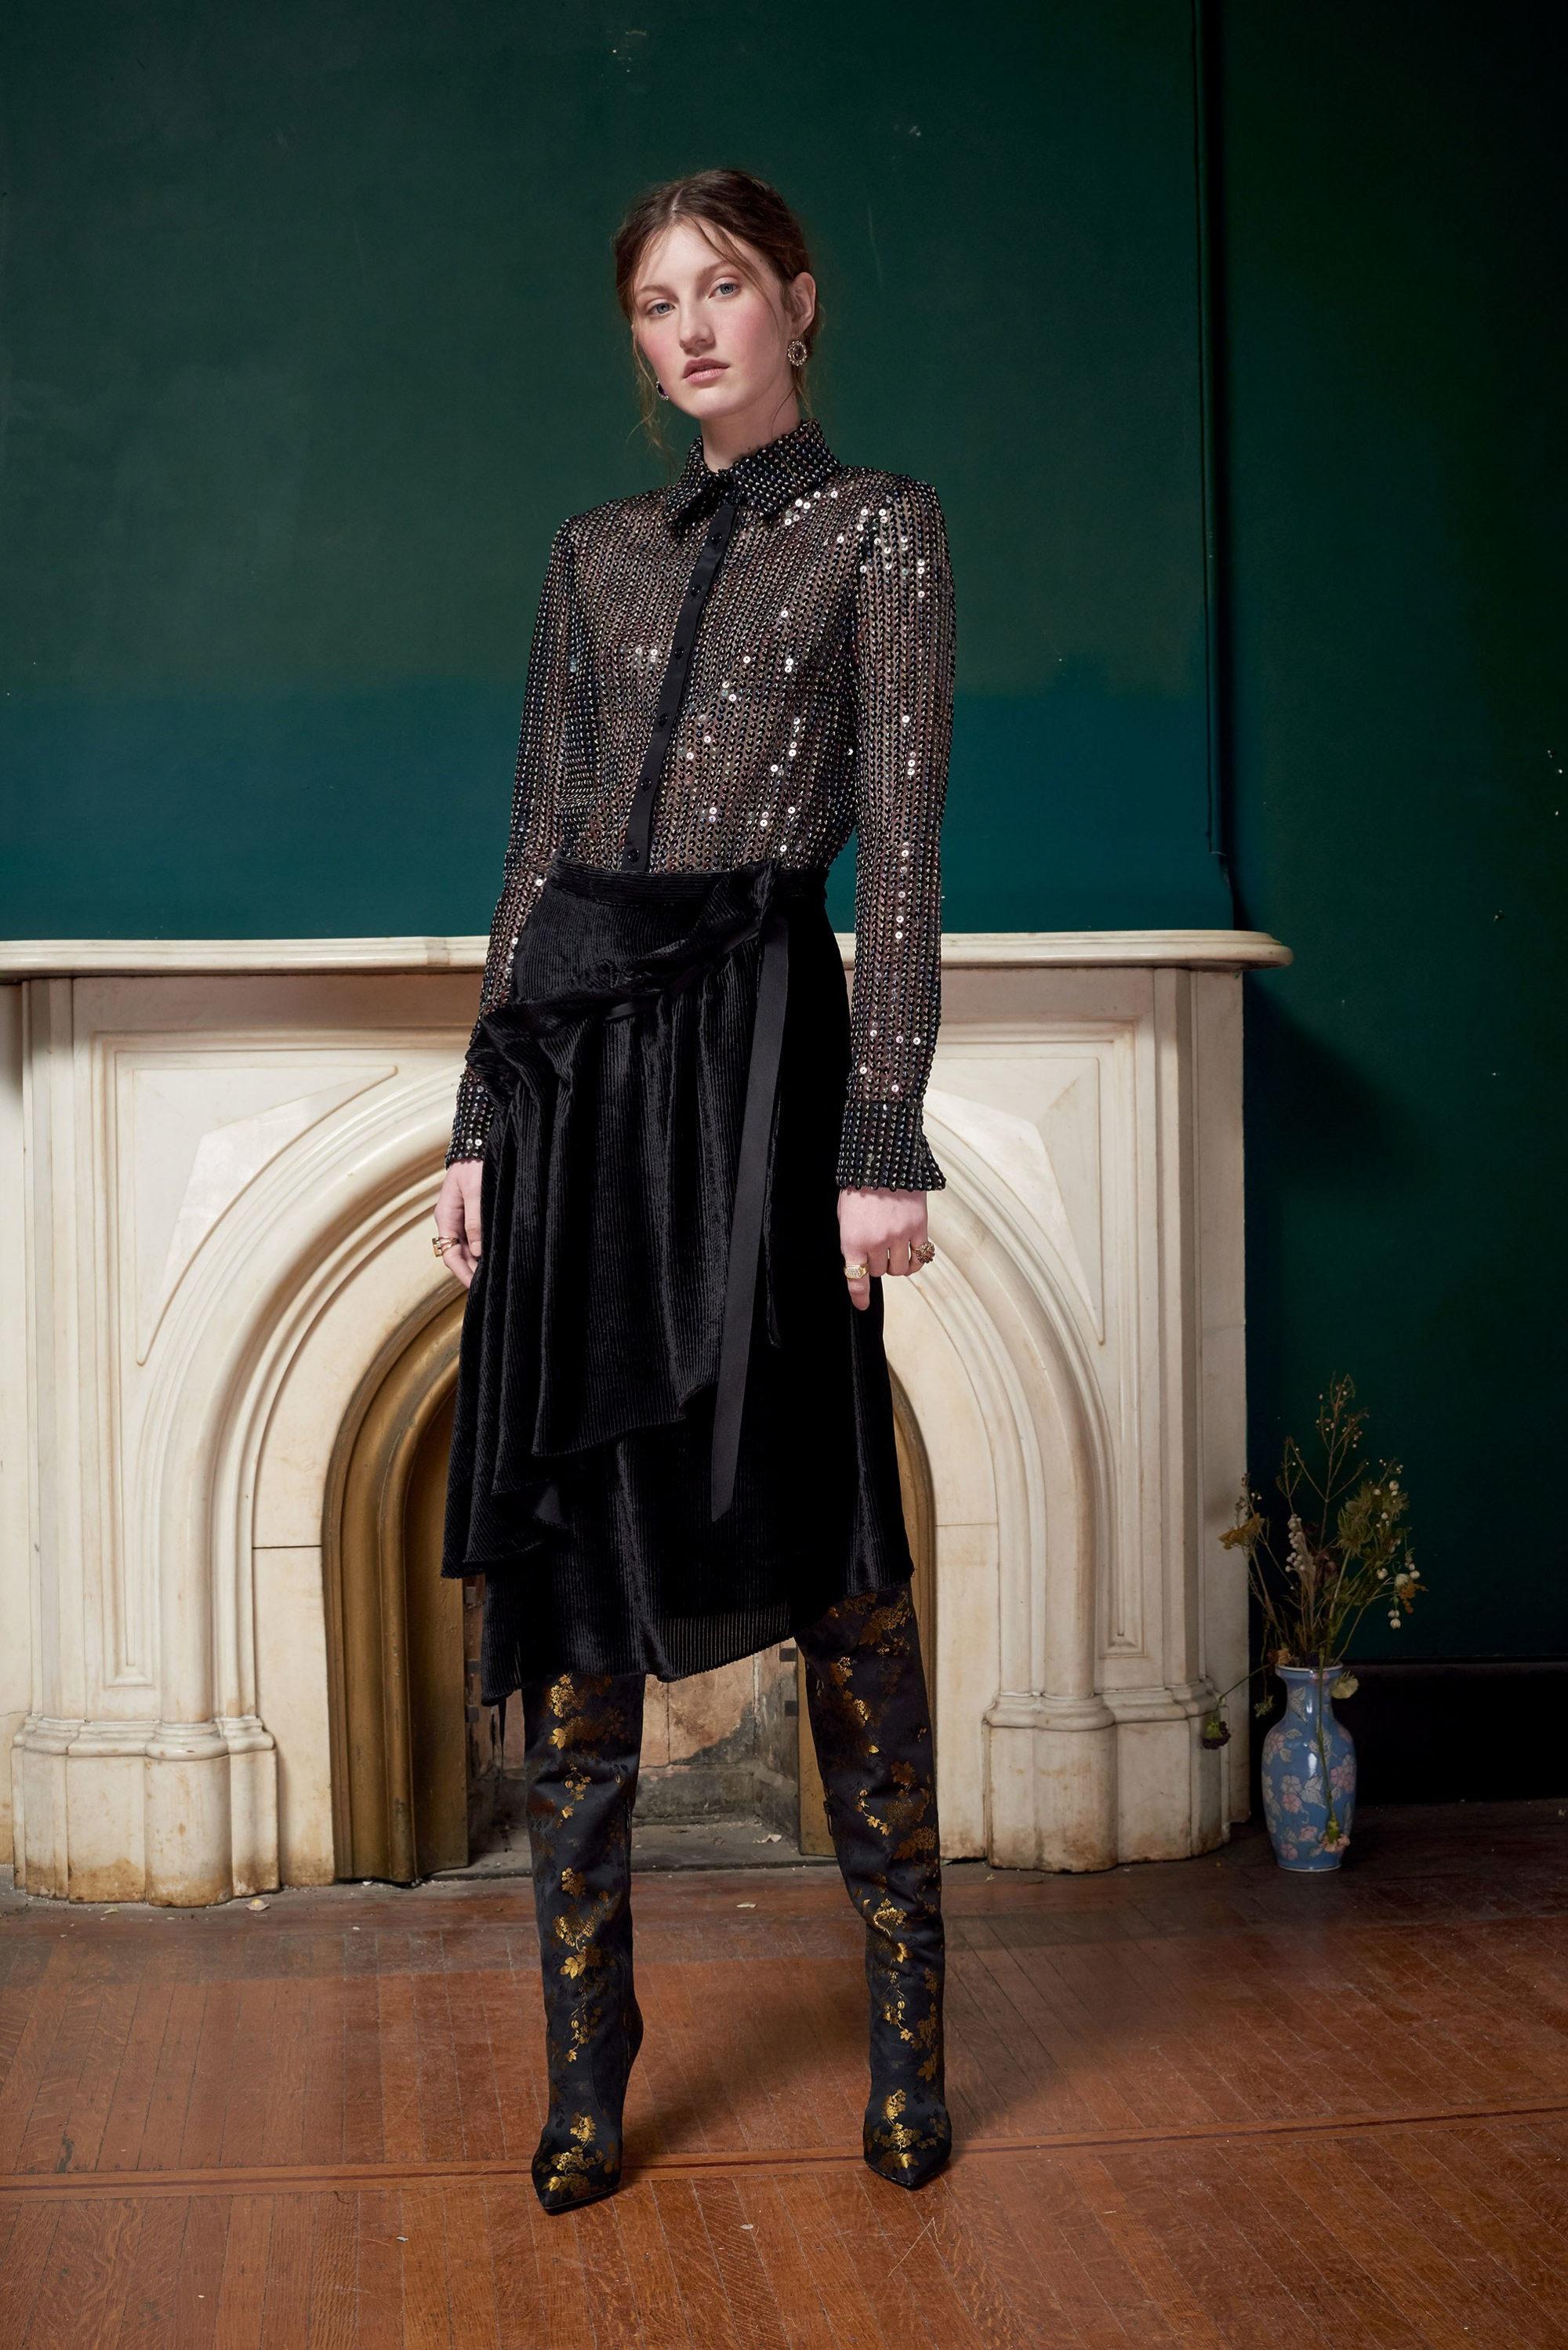 Ashish модная блузка 2019 темно-серого цвета с пайетками